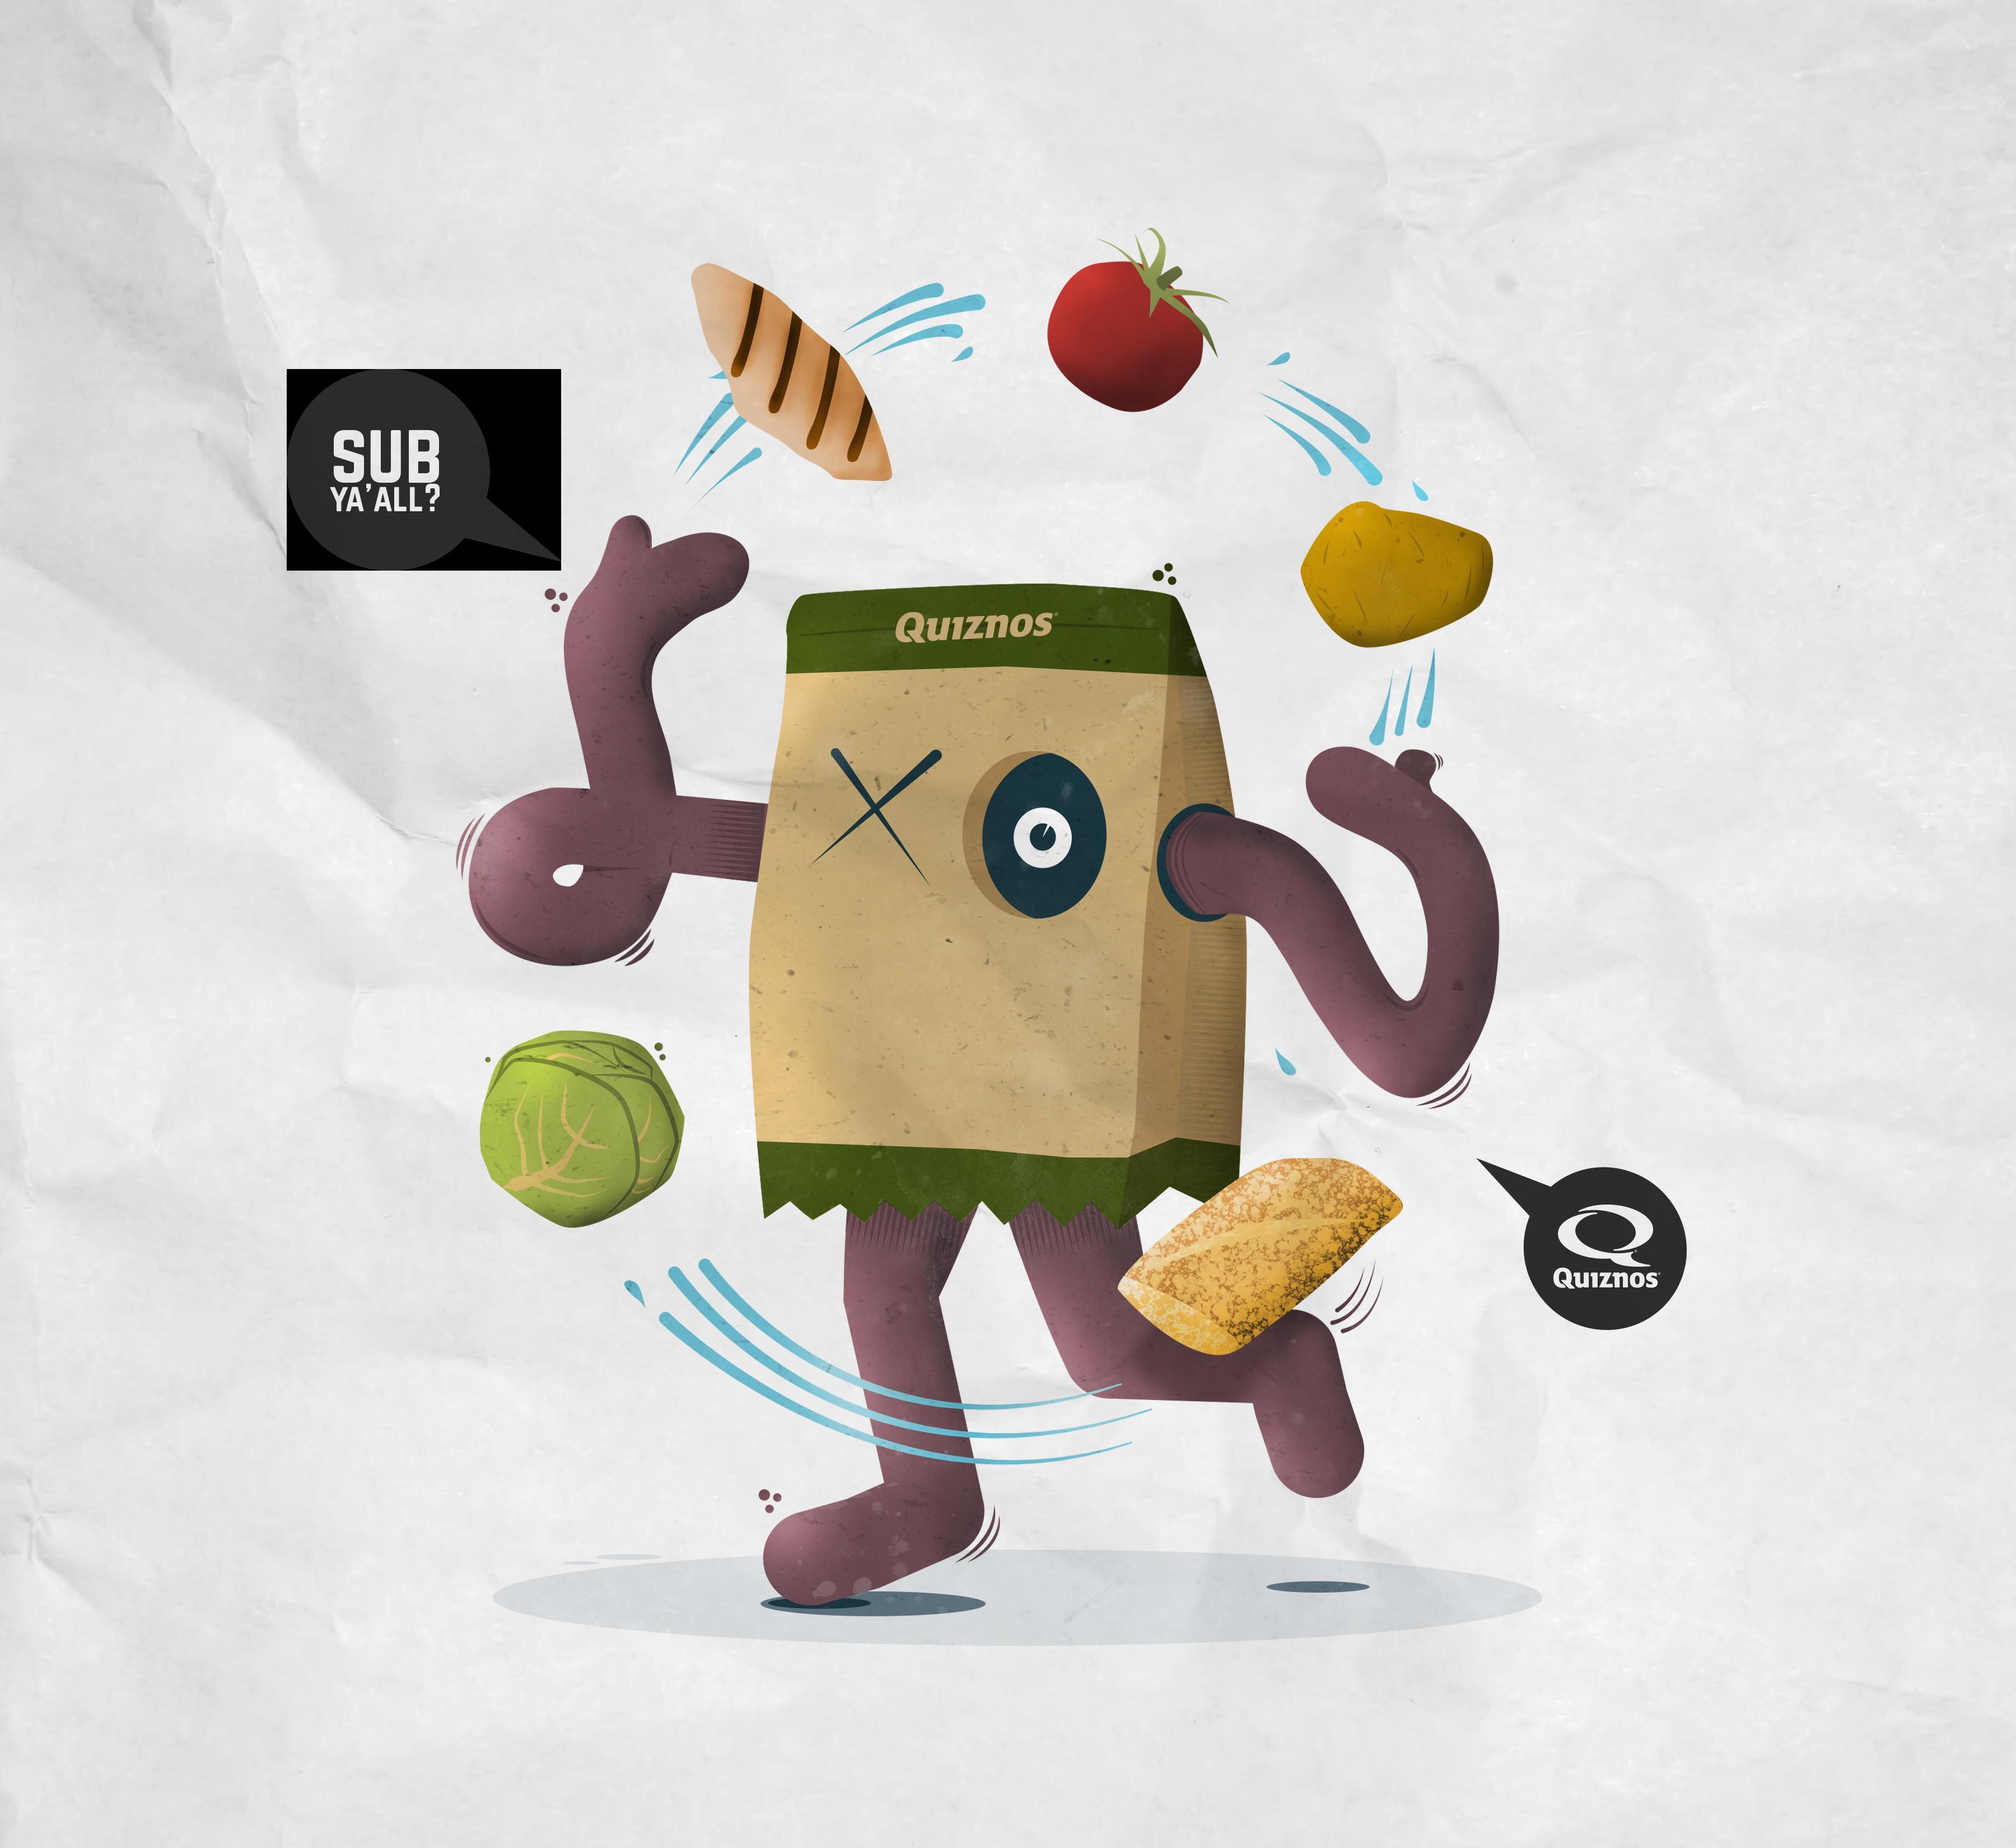 Quiznos 2017 Calendar of Food Illustrations **GUARANTEED** AWARDING 14 WINNING DESIGNS**